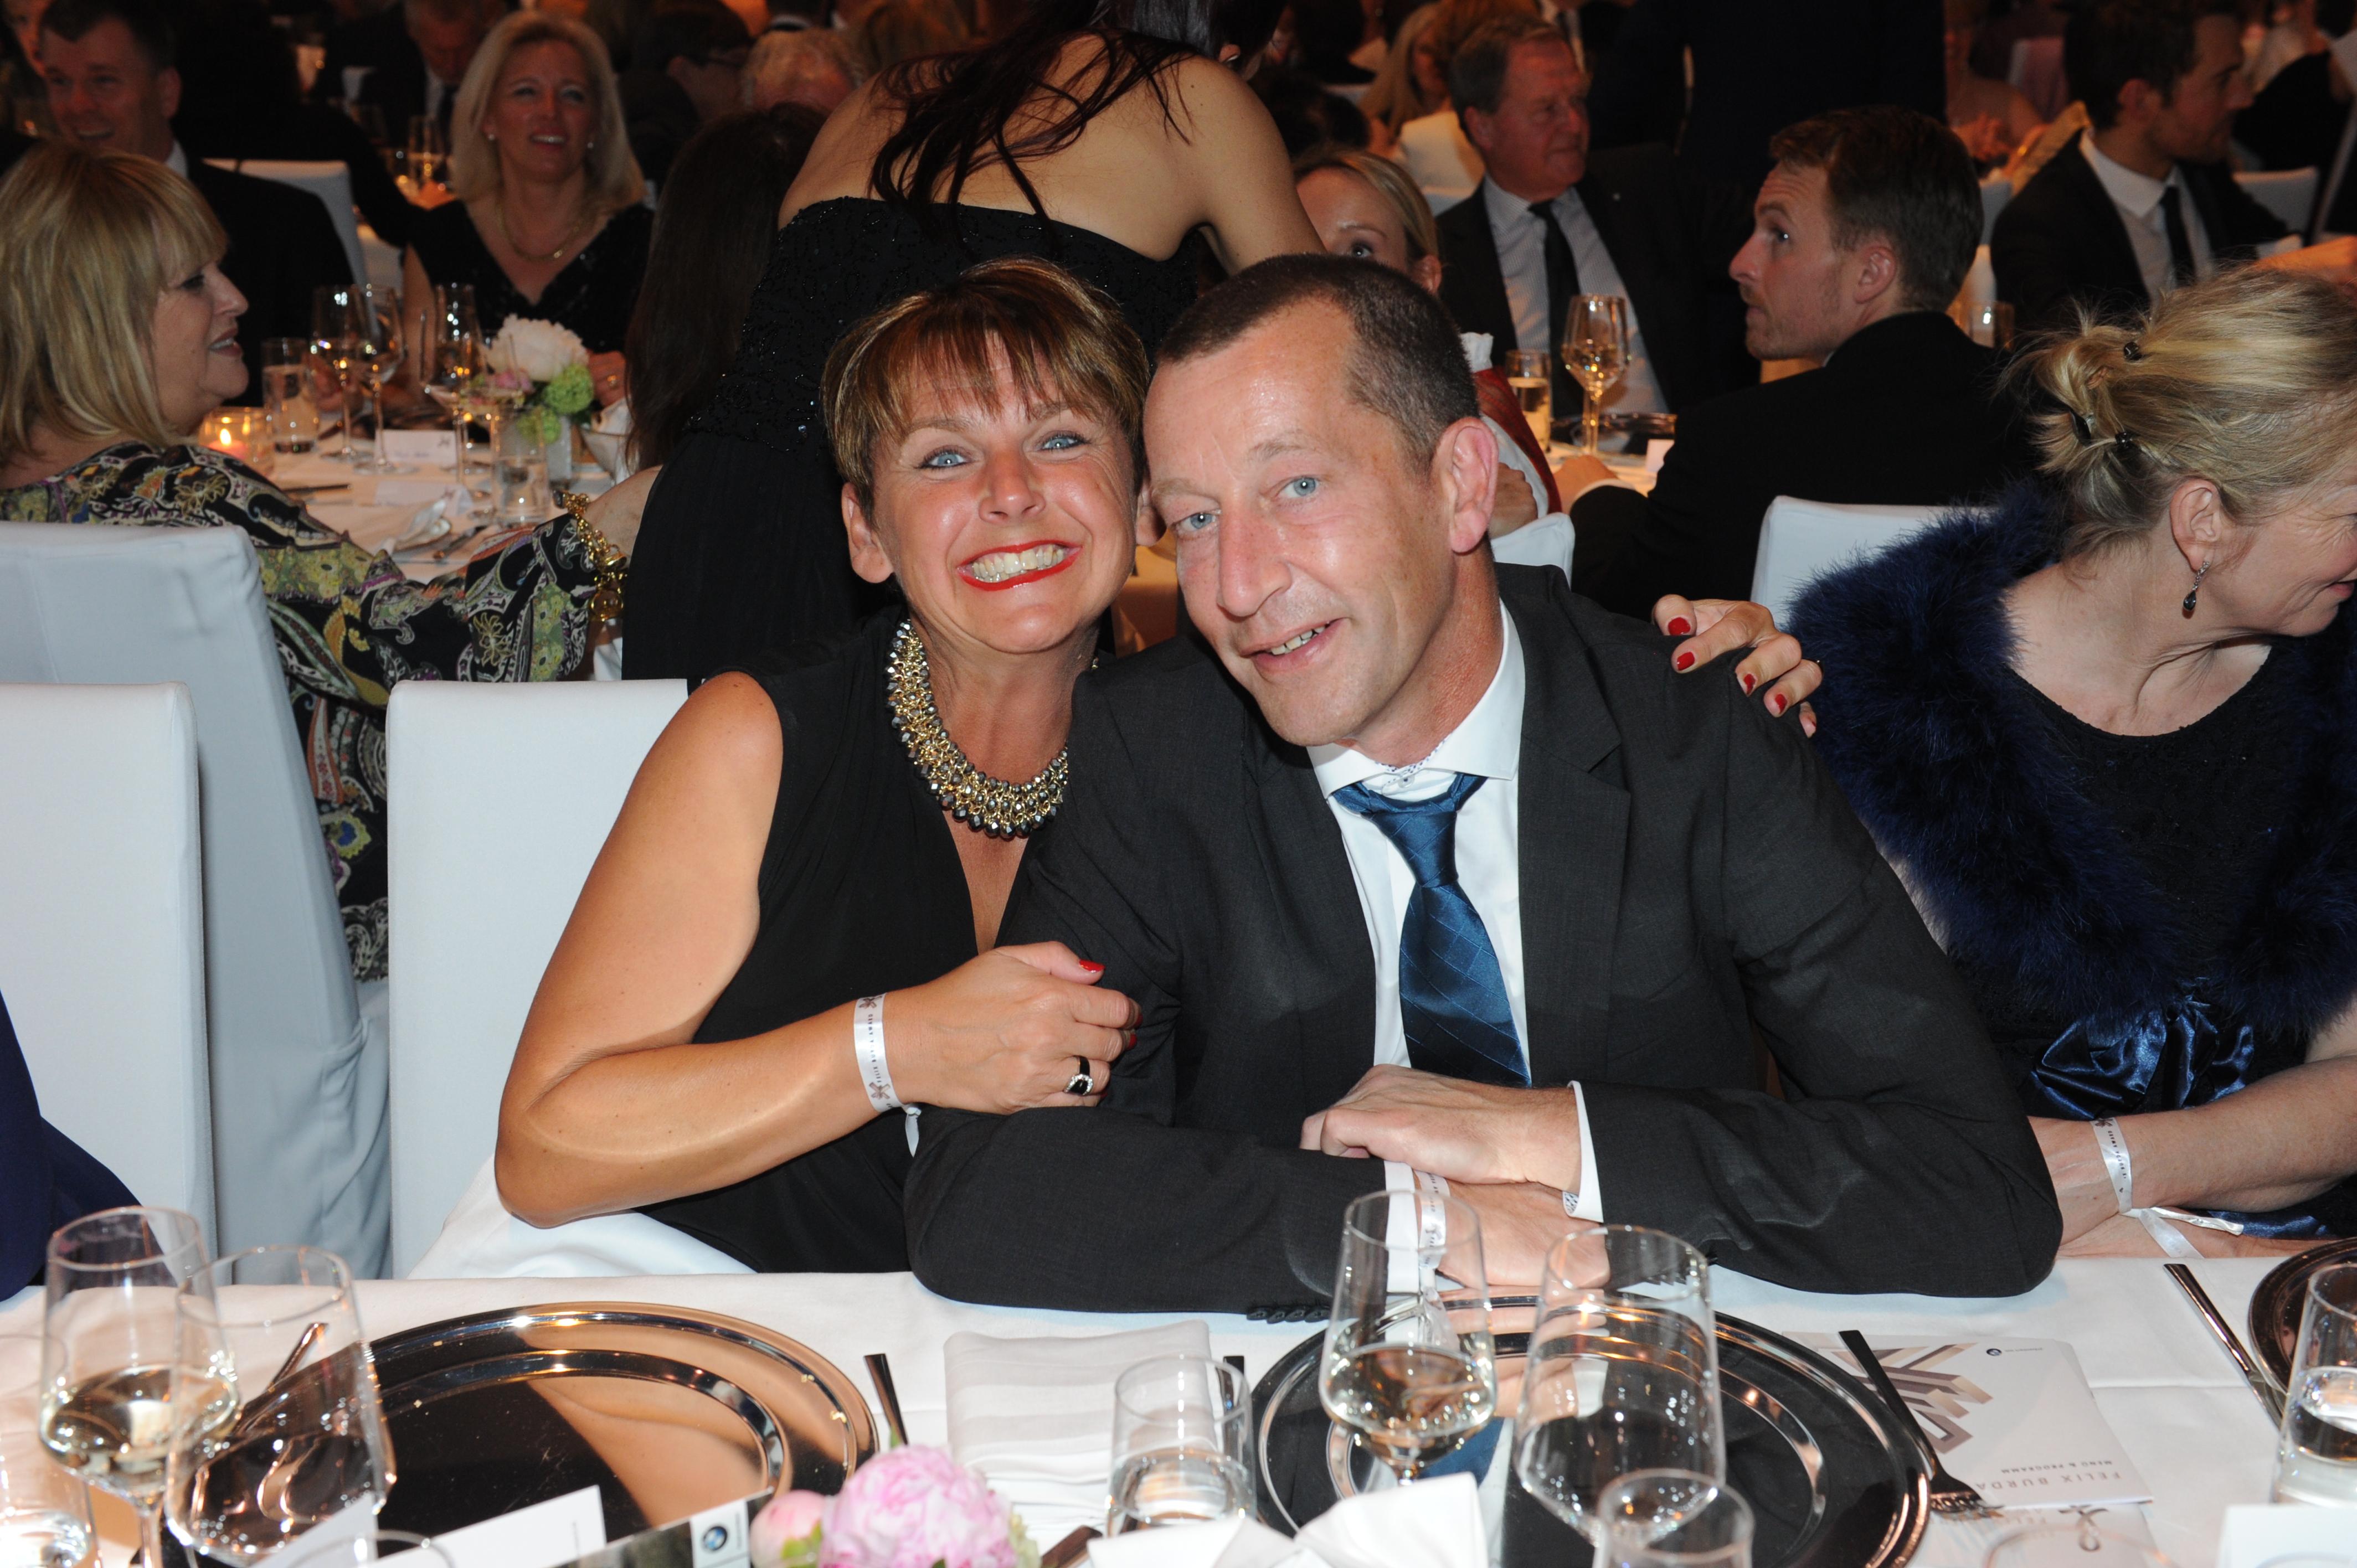 Dr. Albert Beyer (BNG, Sponsor) mit Frau Tanja Beyer FELIX BURDA AWARD 2016 in der BMW Welt MŸünchen am 17.04.2016 Foto: (c) BrauerPhotos fŸr Felix Burda Stiftung